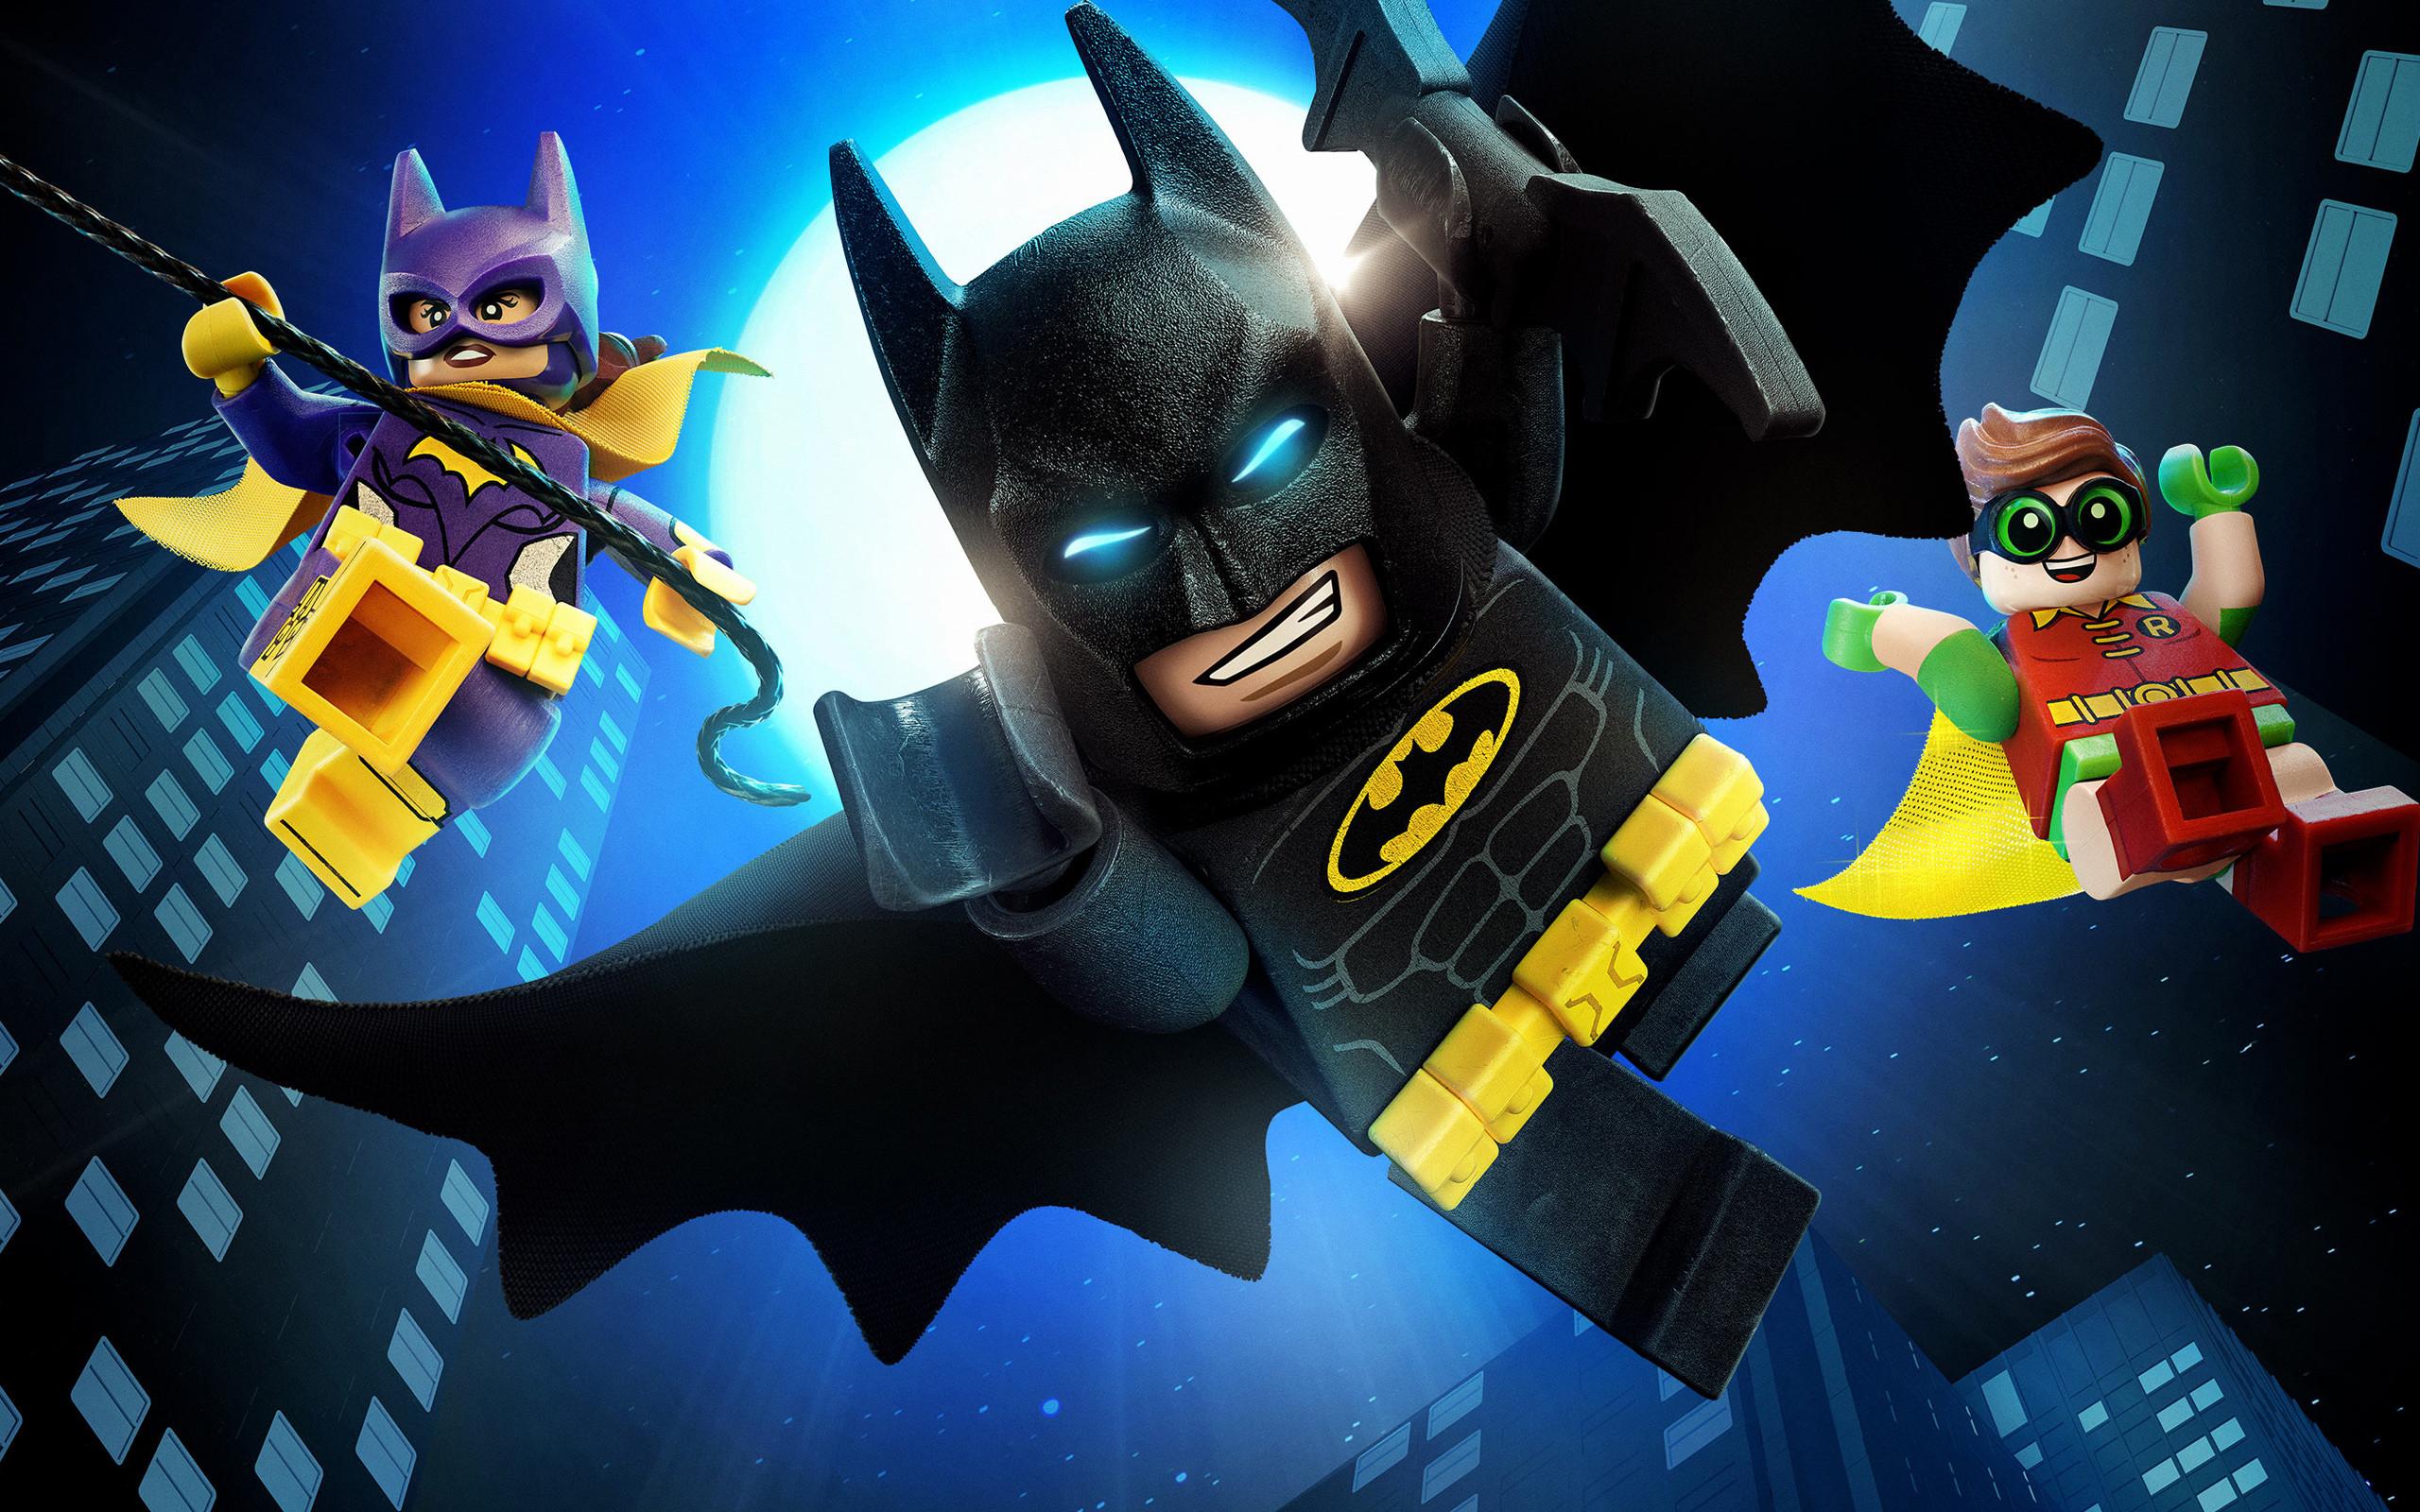 The LEGO Batman Movie wallpaper | The LEGO Batman Movie wallpapers hd |  Pinterest | Lego batman movie, Movie wallpapers and Lego batman